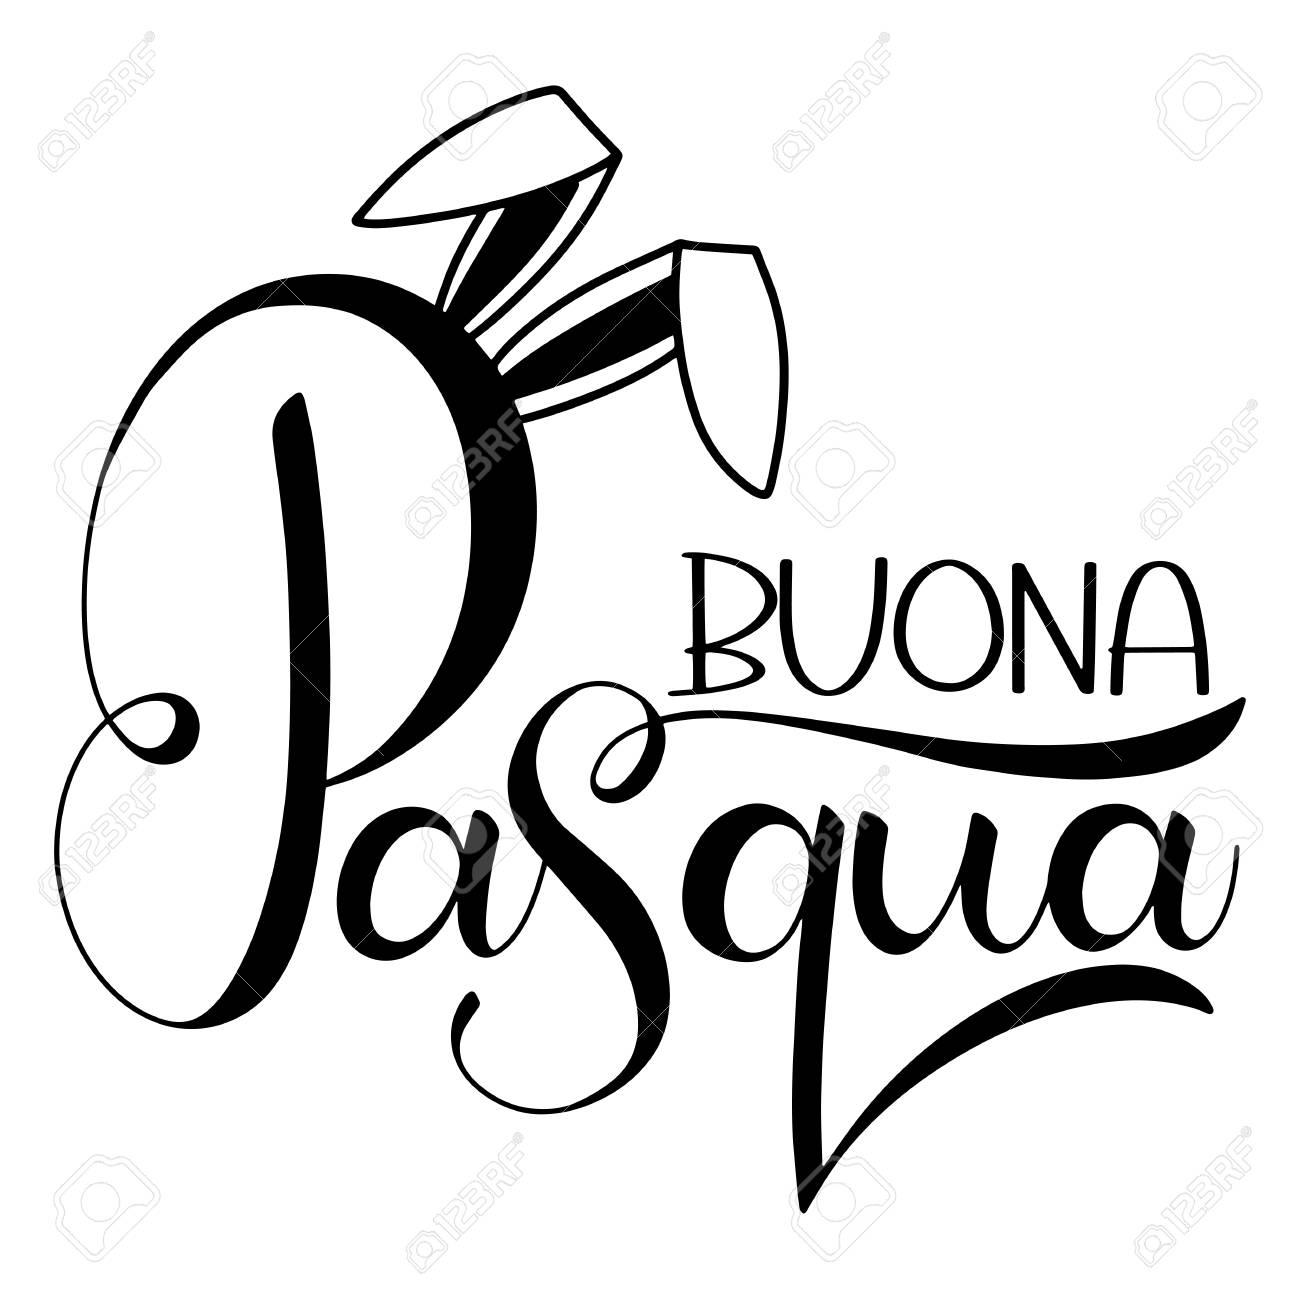 Buona pasqua lettering happy easter colorful lettering in italian seasons greetings buona pasqua lettering happy easter colorful lettering in italian hand written easter phrases m4hsunfo